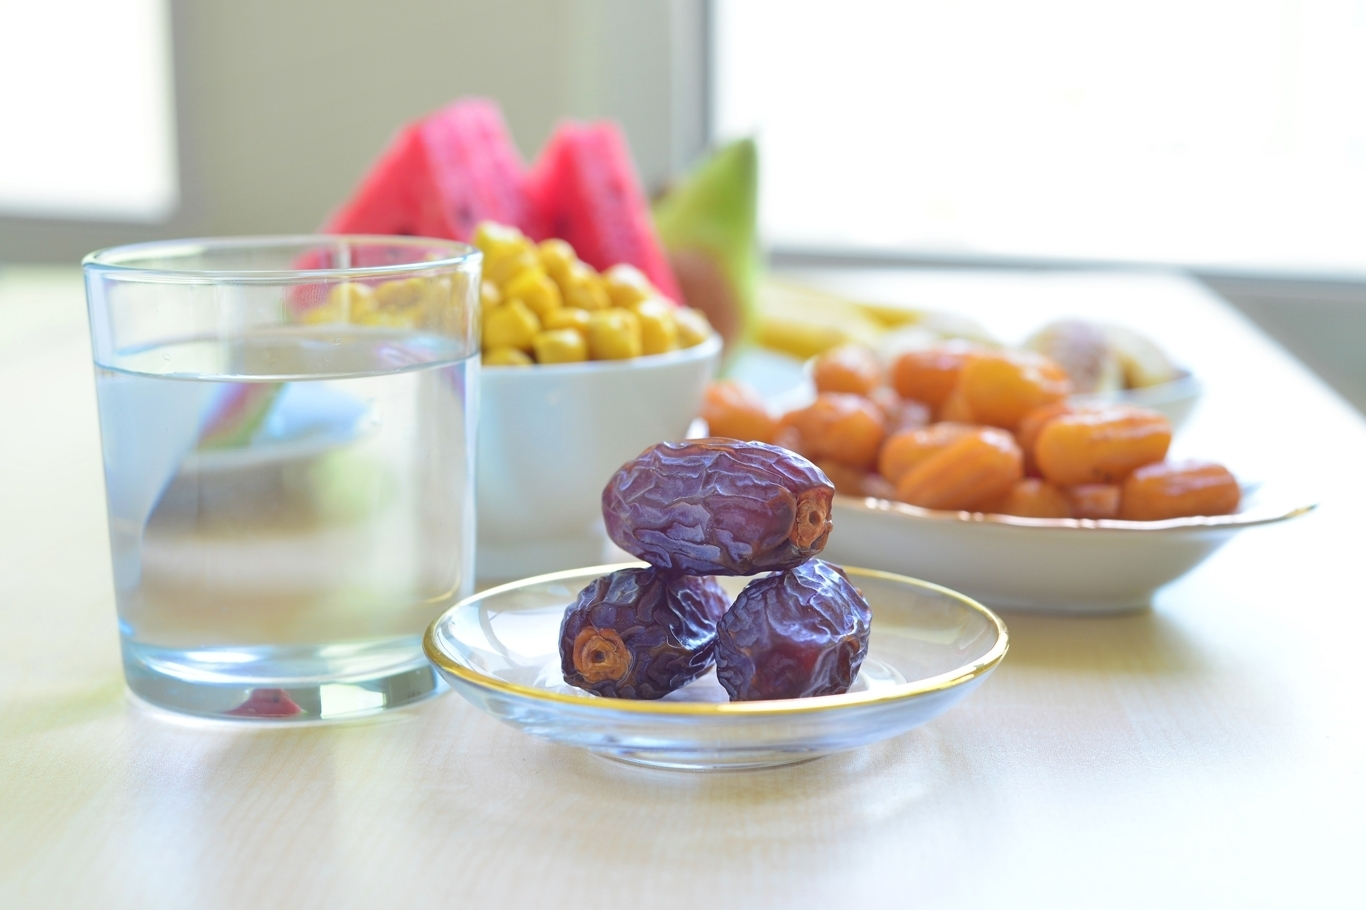 Soğan Kaç Kalori Zayıflatırmı Kilo Aldırırmı Soğan Suyu İle Zayıflama